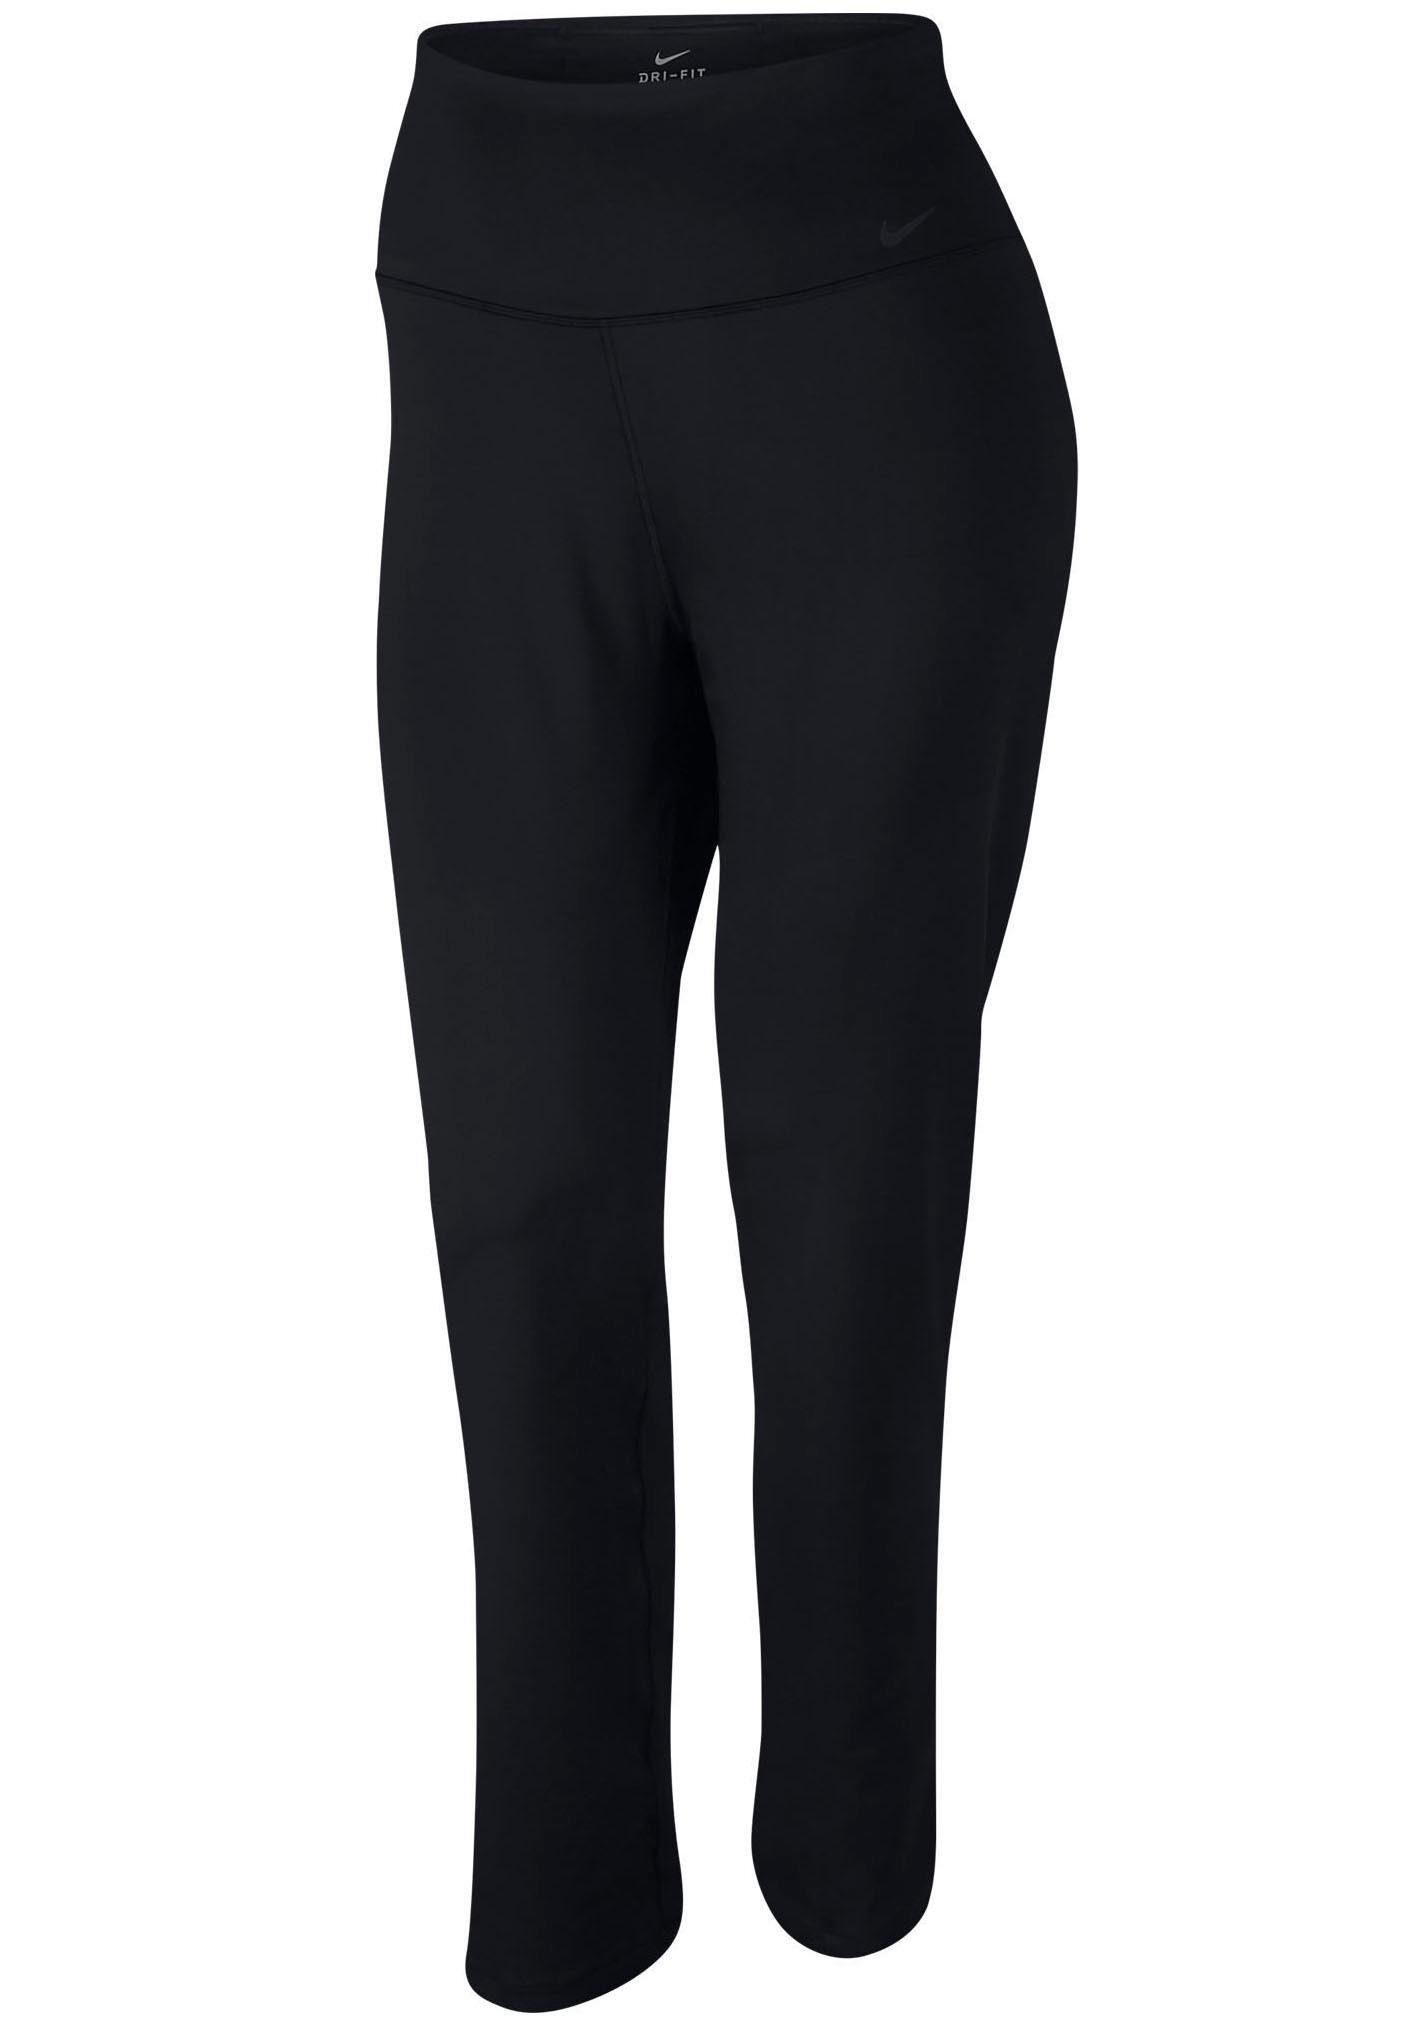 Nike Trainingshose »WO'MEN NIKE POWER CLASSIC GYM PANT PLUS SIZE« Große Größen online kaufen   OTTO